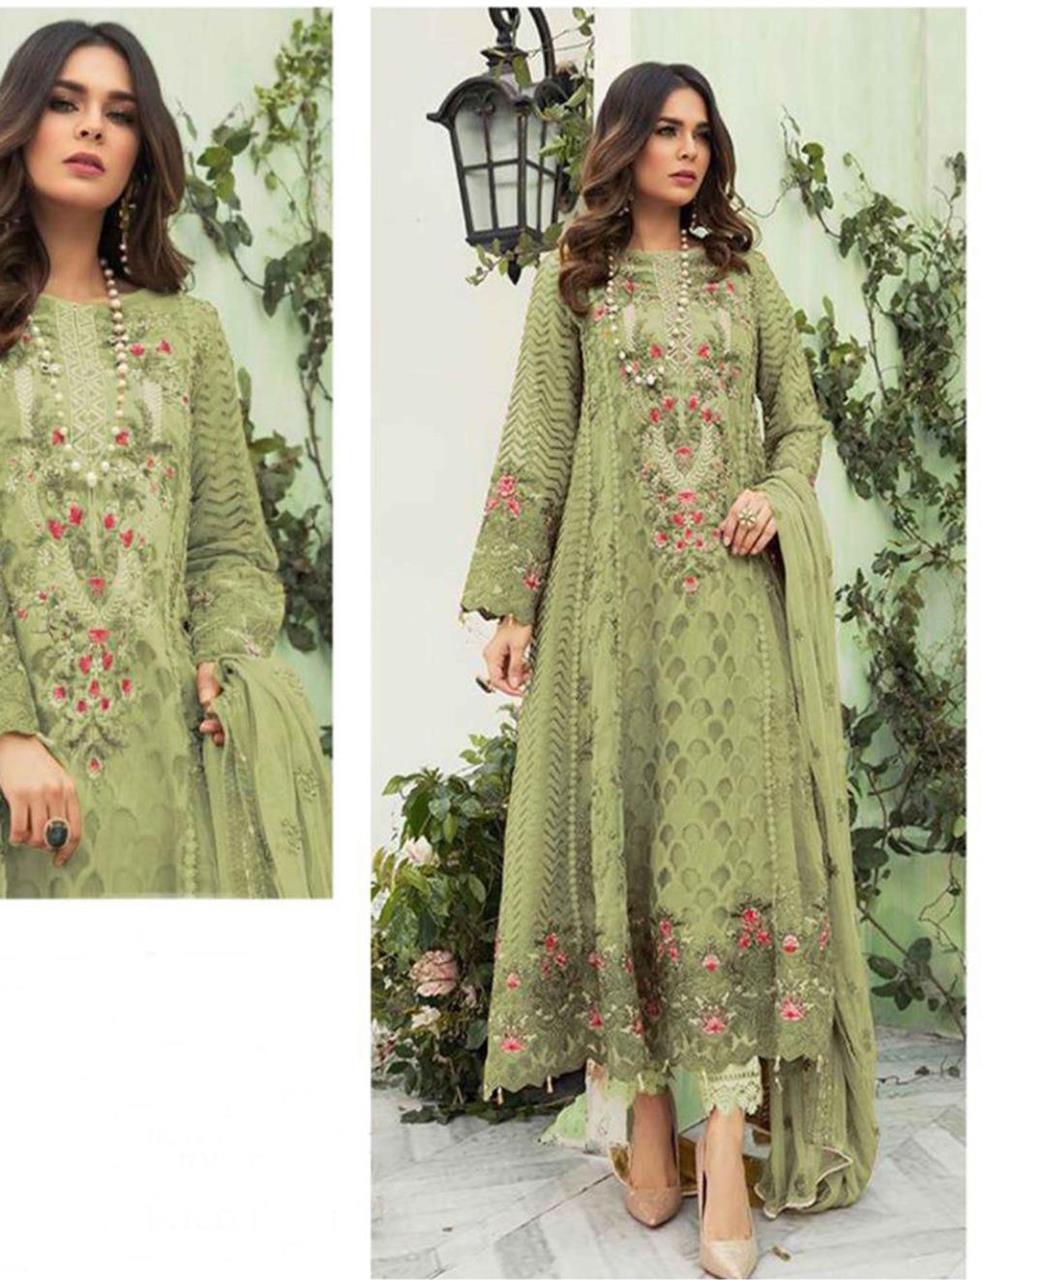 Embroidered Georgette Straight cut Salwar Kameez in Pista Green